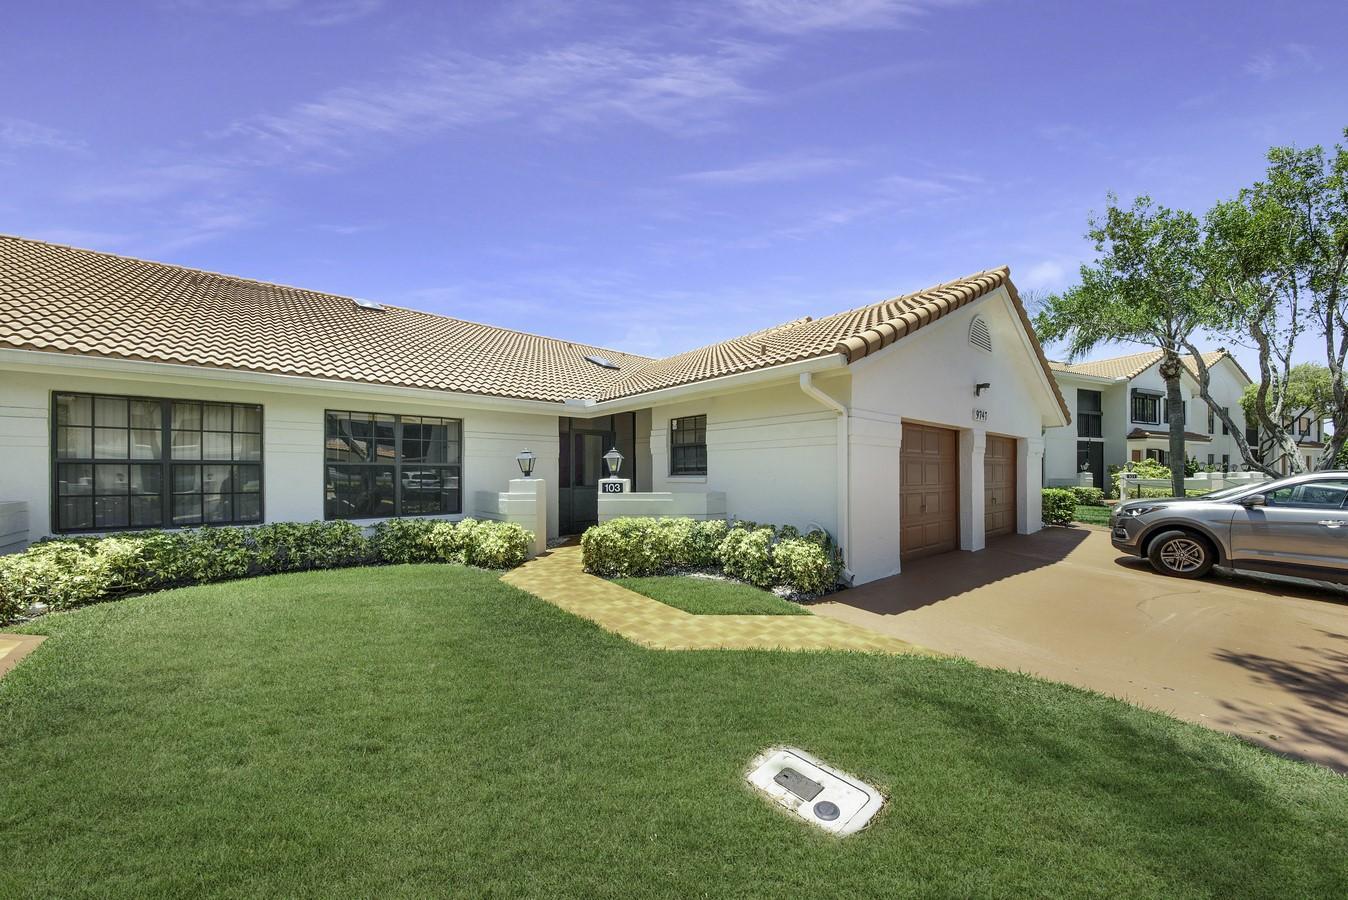 9747 Pavarotti Terrace 103 Boynton Beach, FL 33437 photo 27